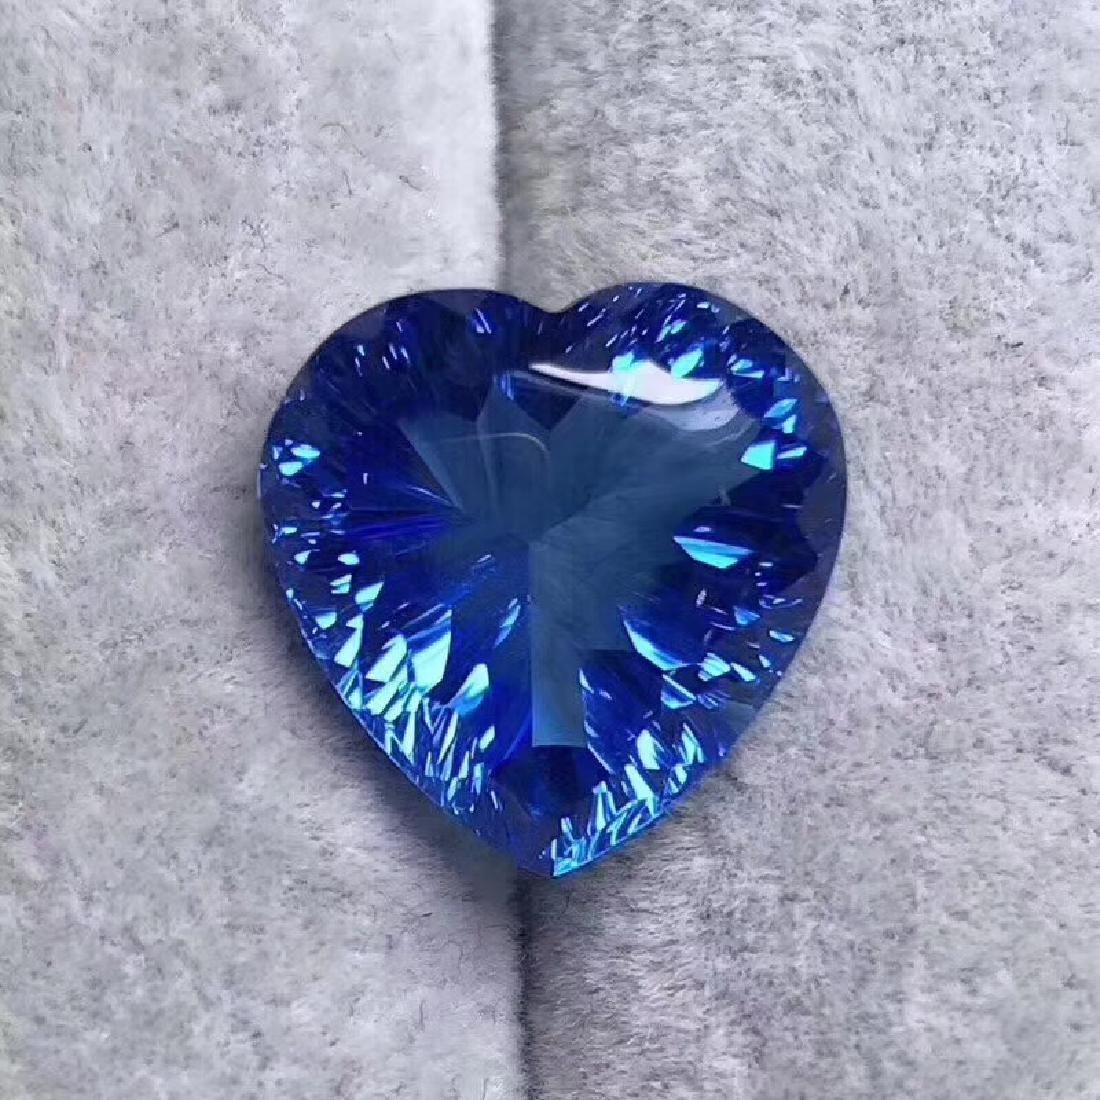 19.64 ct Topaz 16.3*16.2 mm Heart Cut